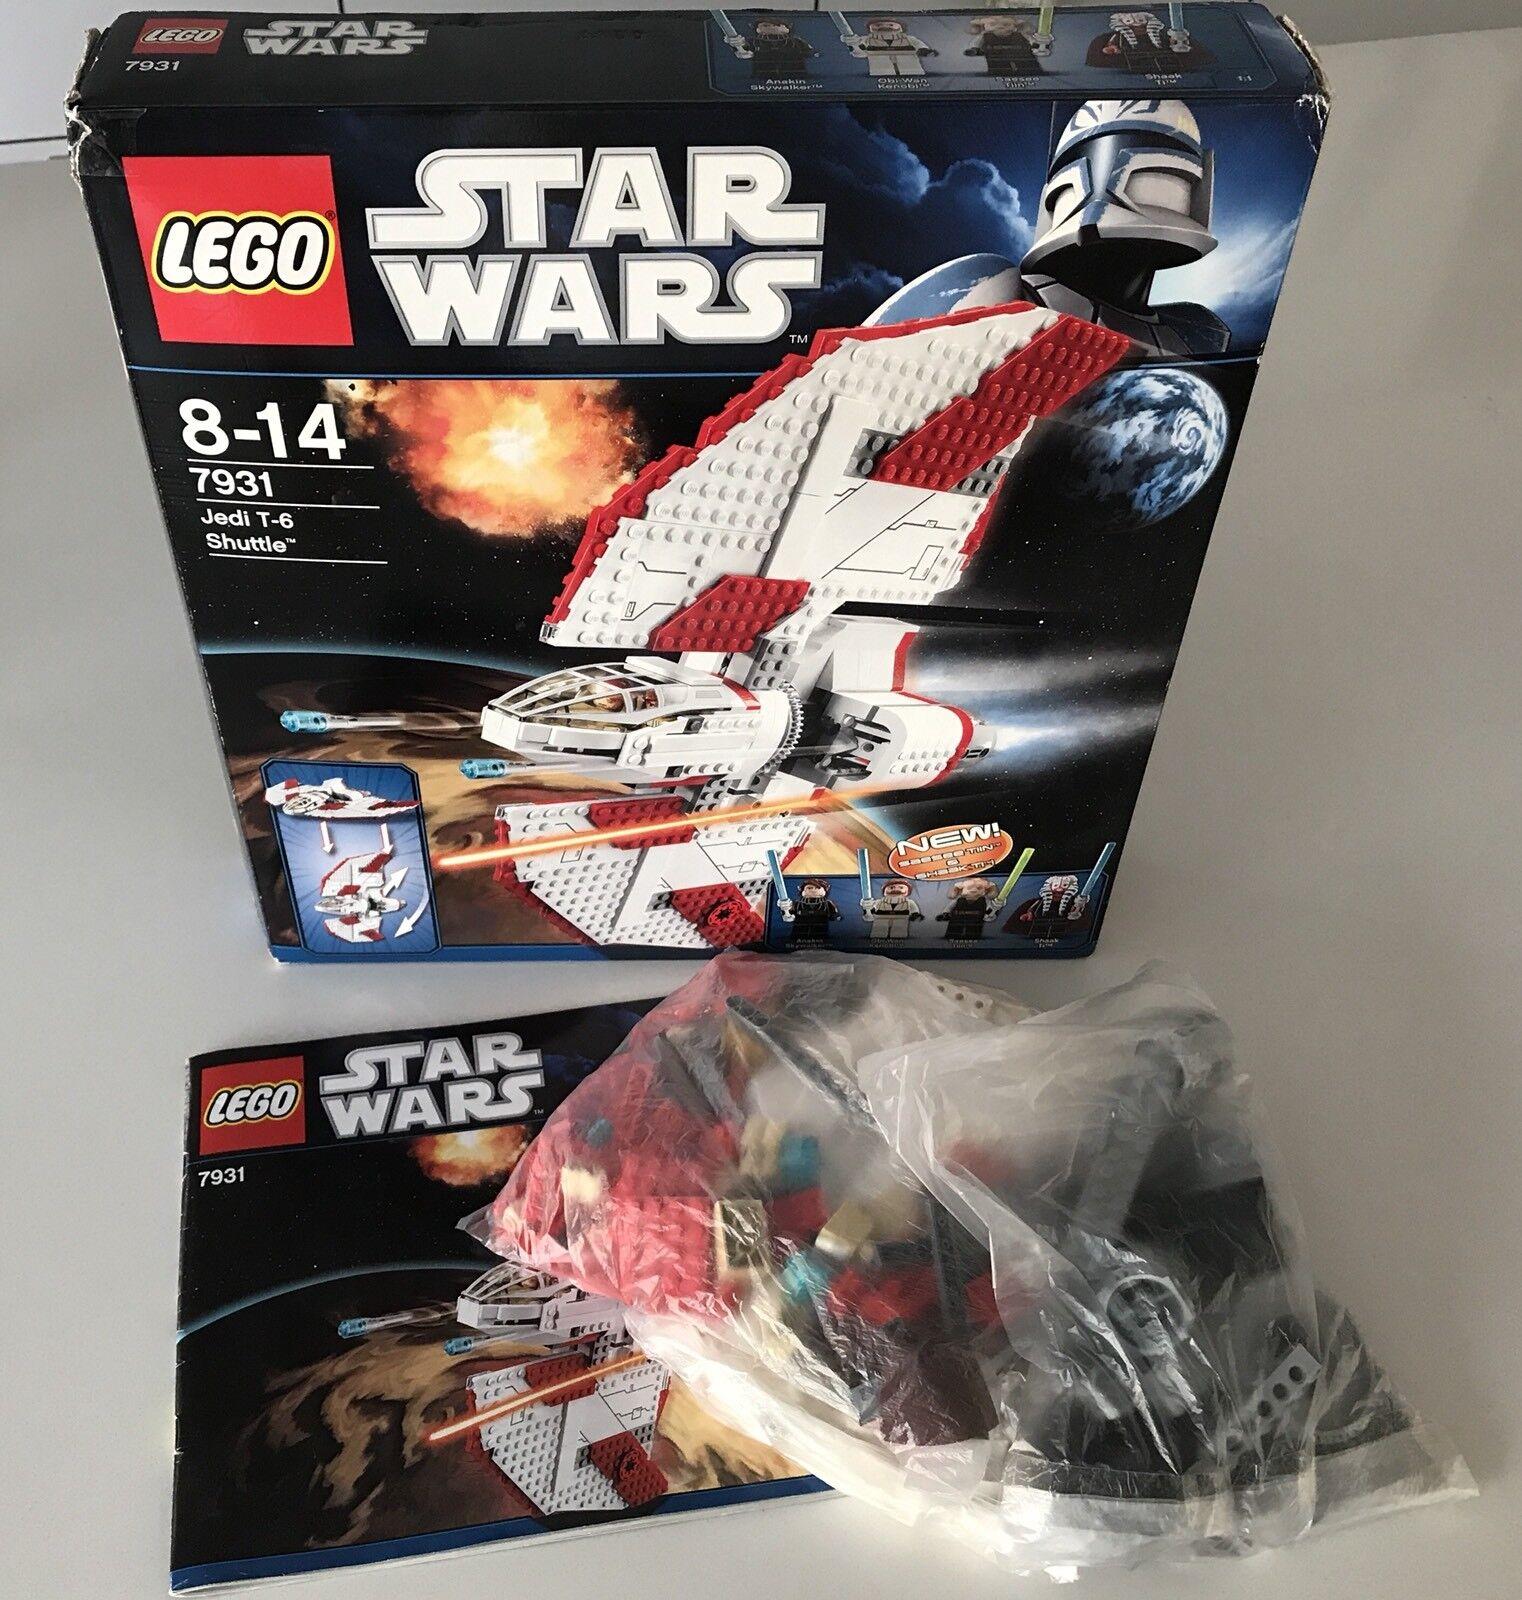 LEGO STAR WARS 7931 T-6 Jedi Shuttle, BA + OVP